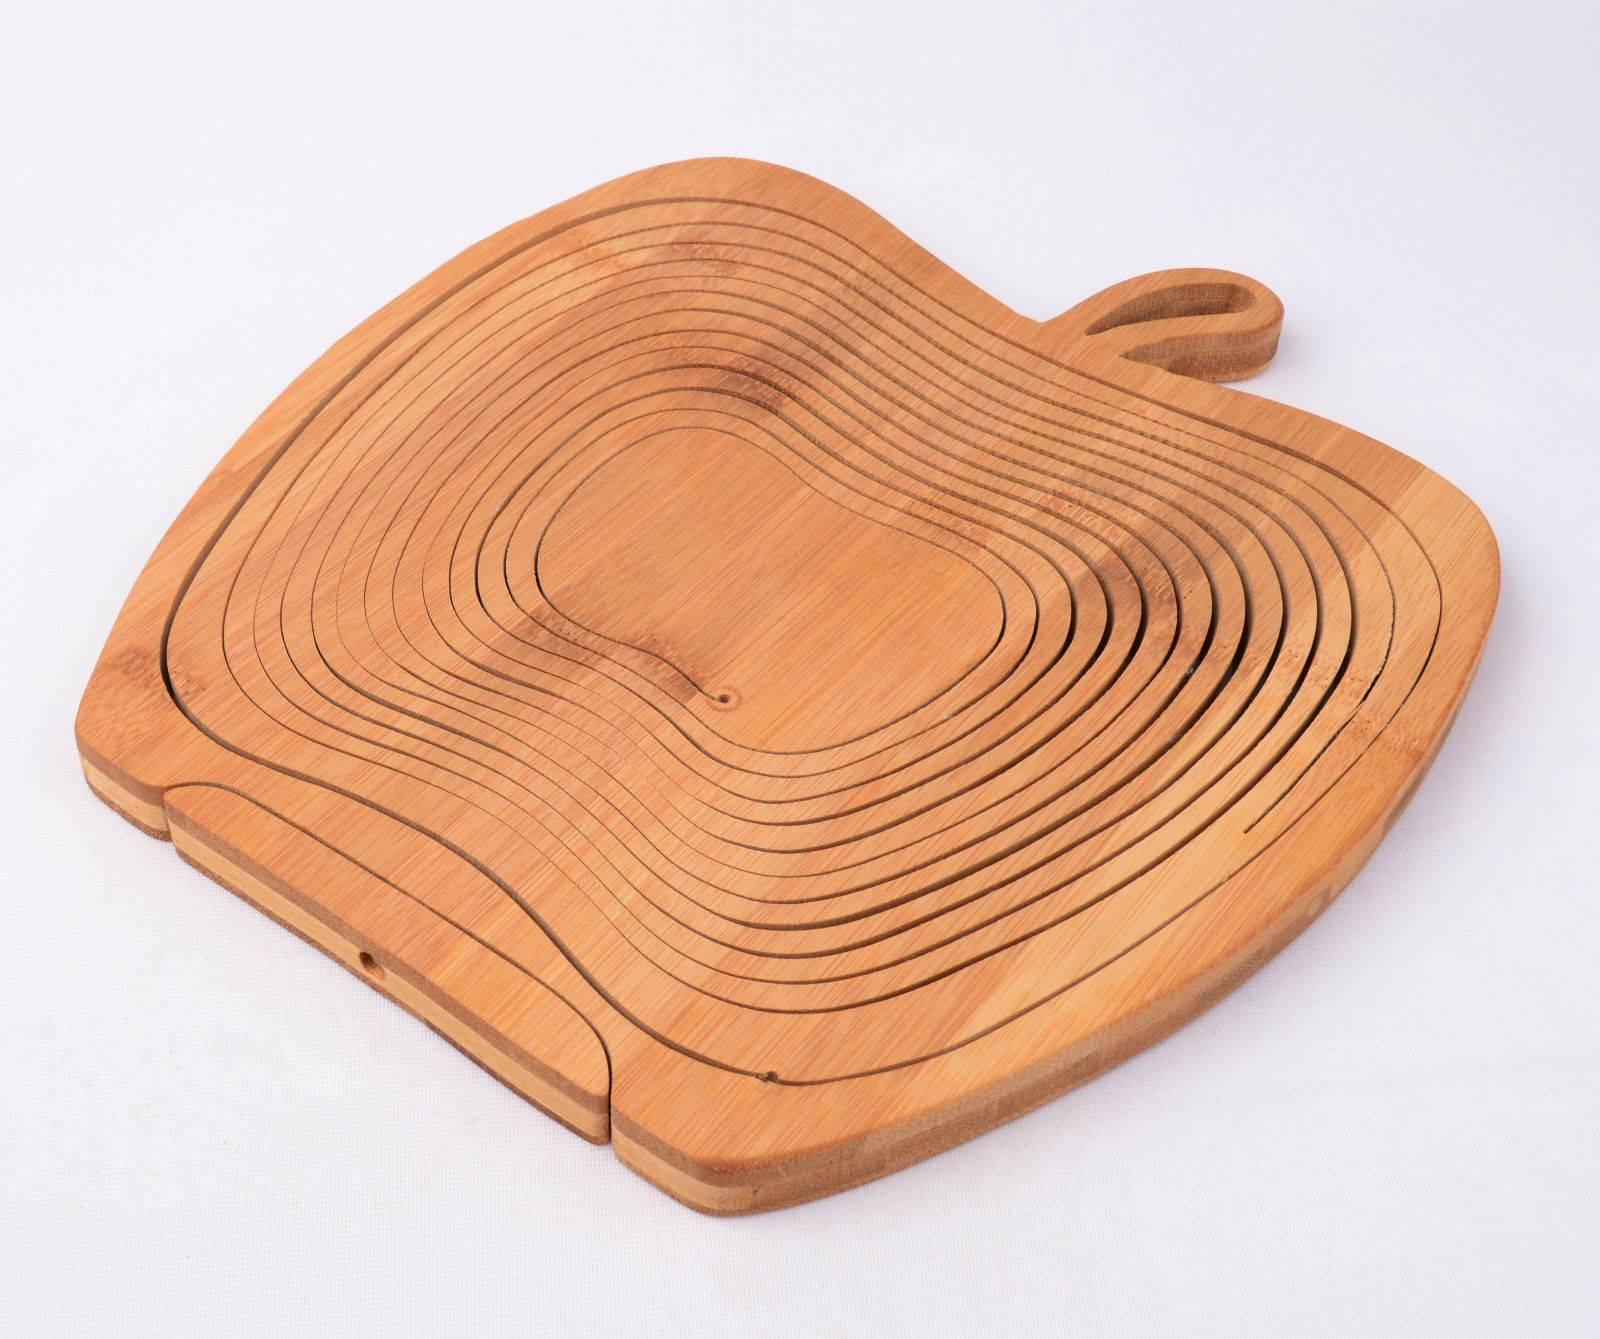 Apple Shaped Bamboo Wooden Folding Fruit Egg Basket